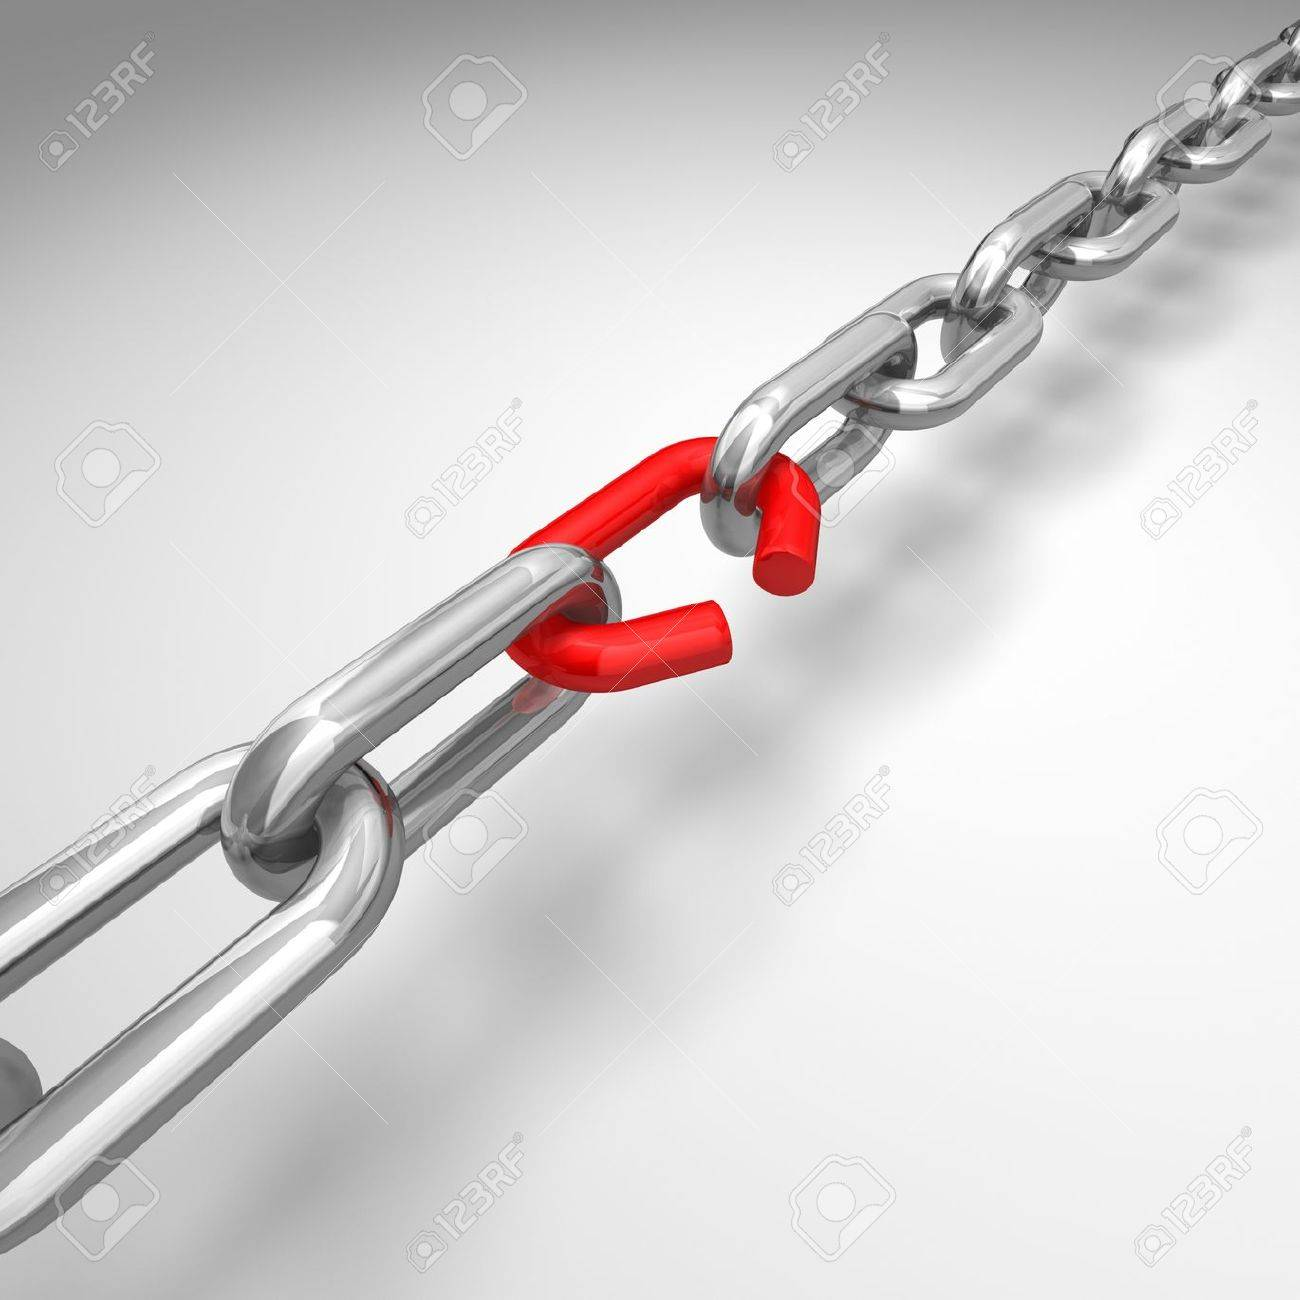 3d illustration of a broken silver chain - conceptual image Stock Illustration - 7476397